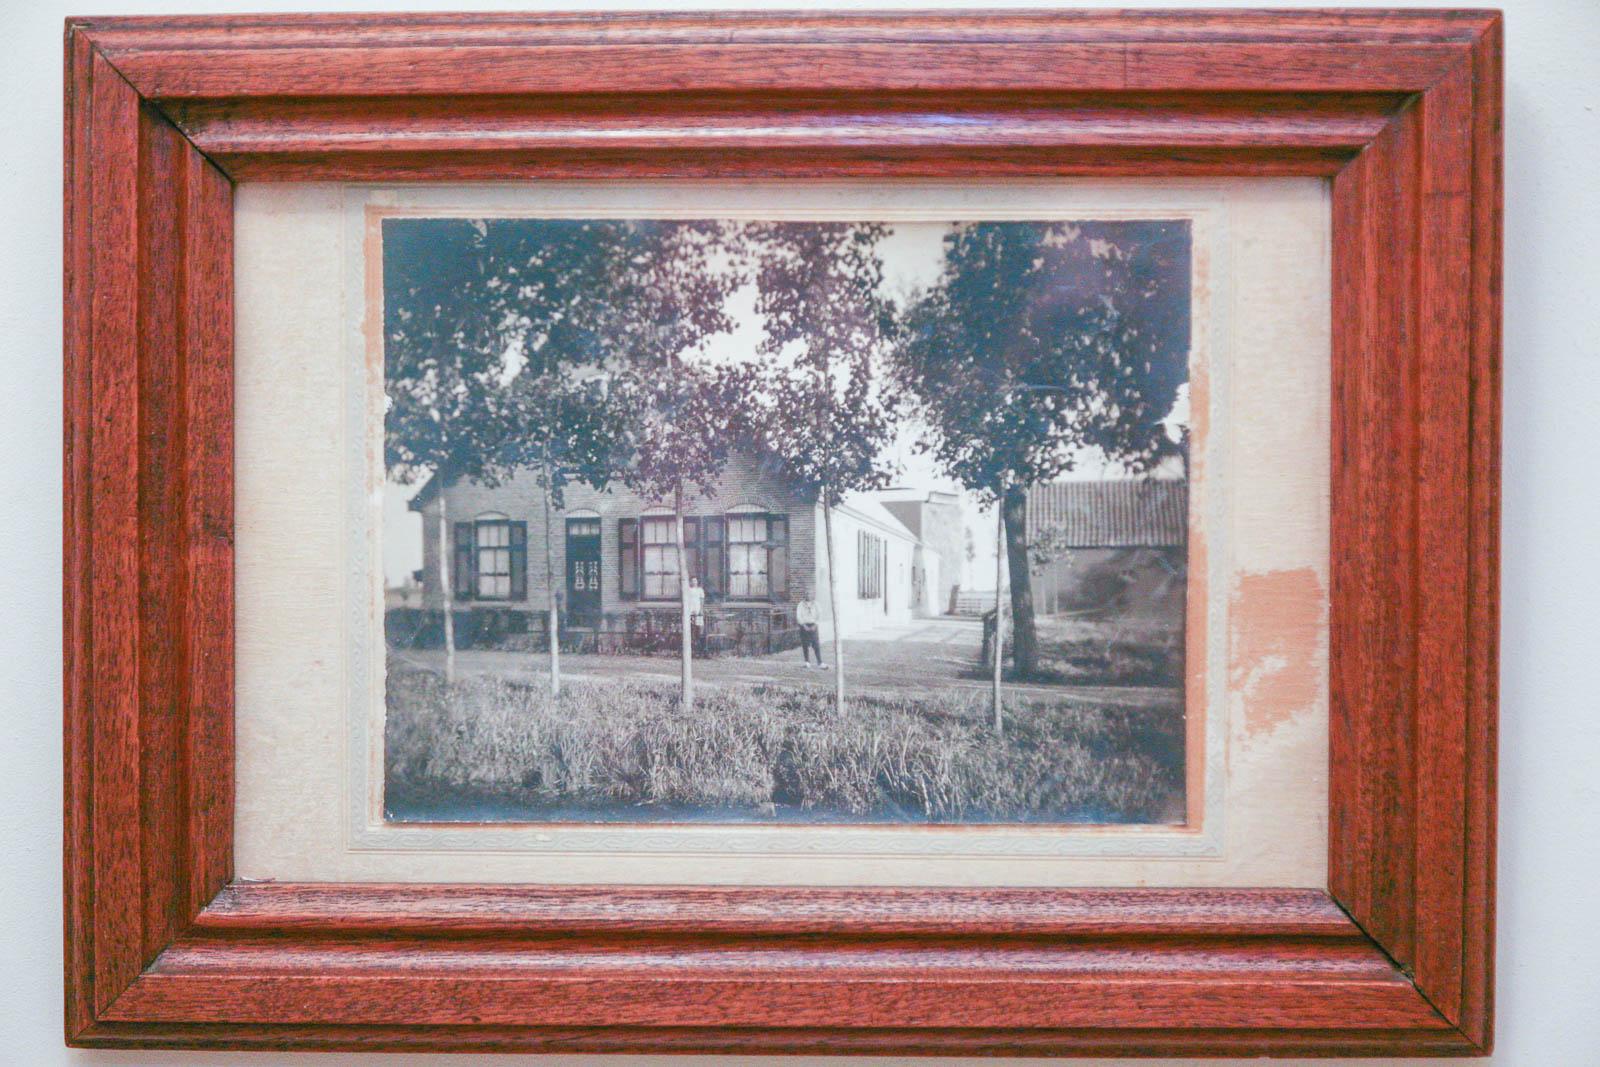 Hillegondahoeve-De Oude Stal-1434